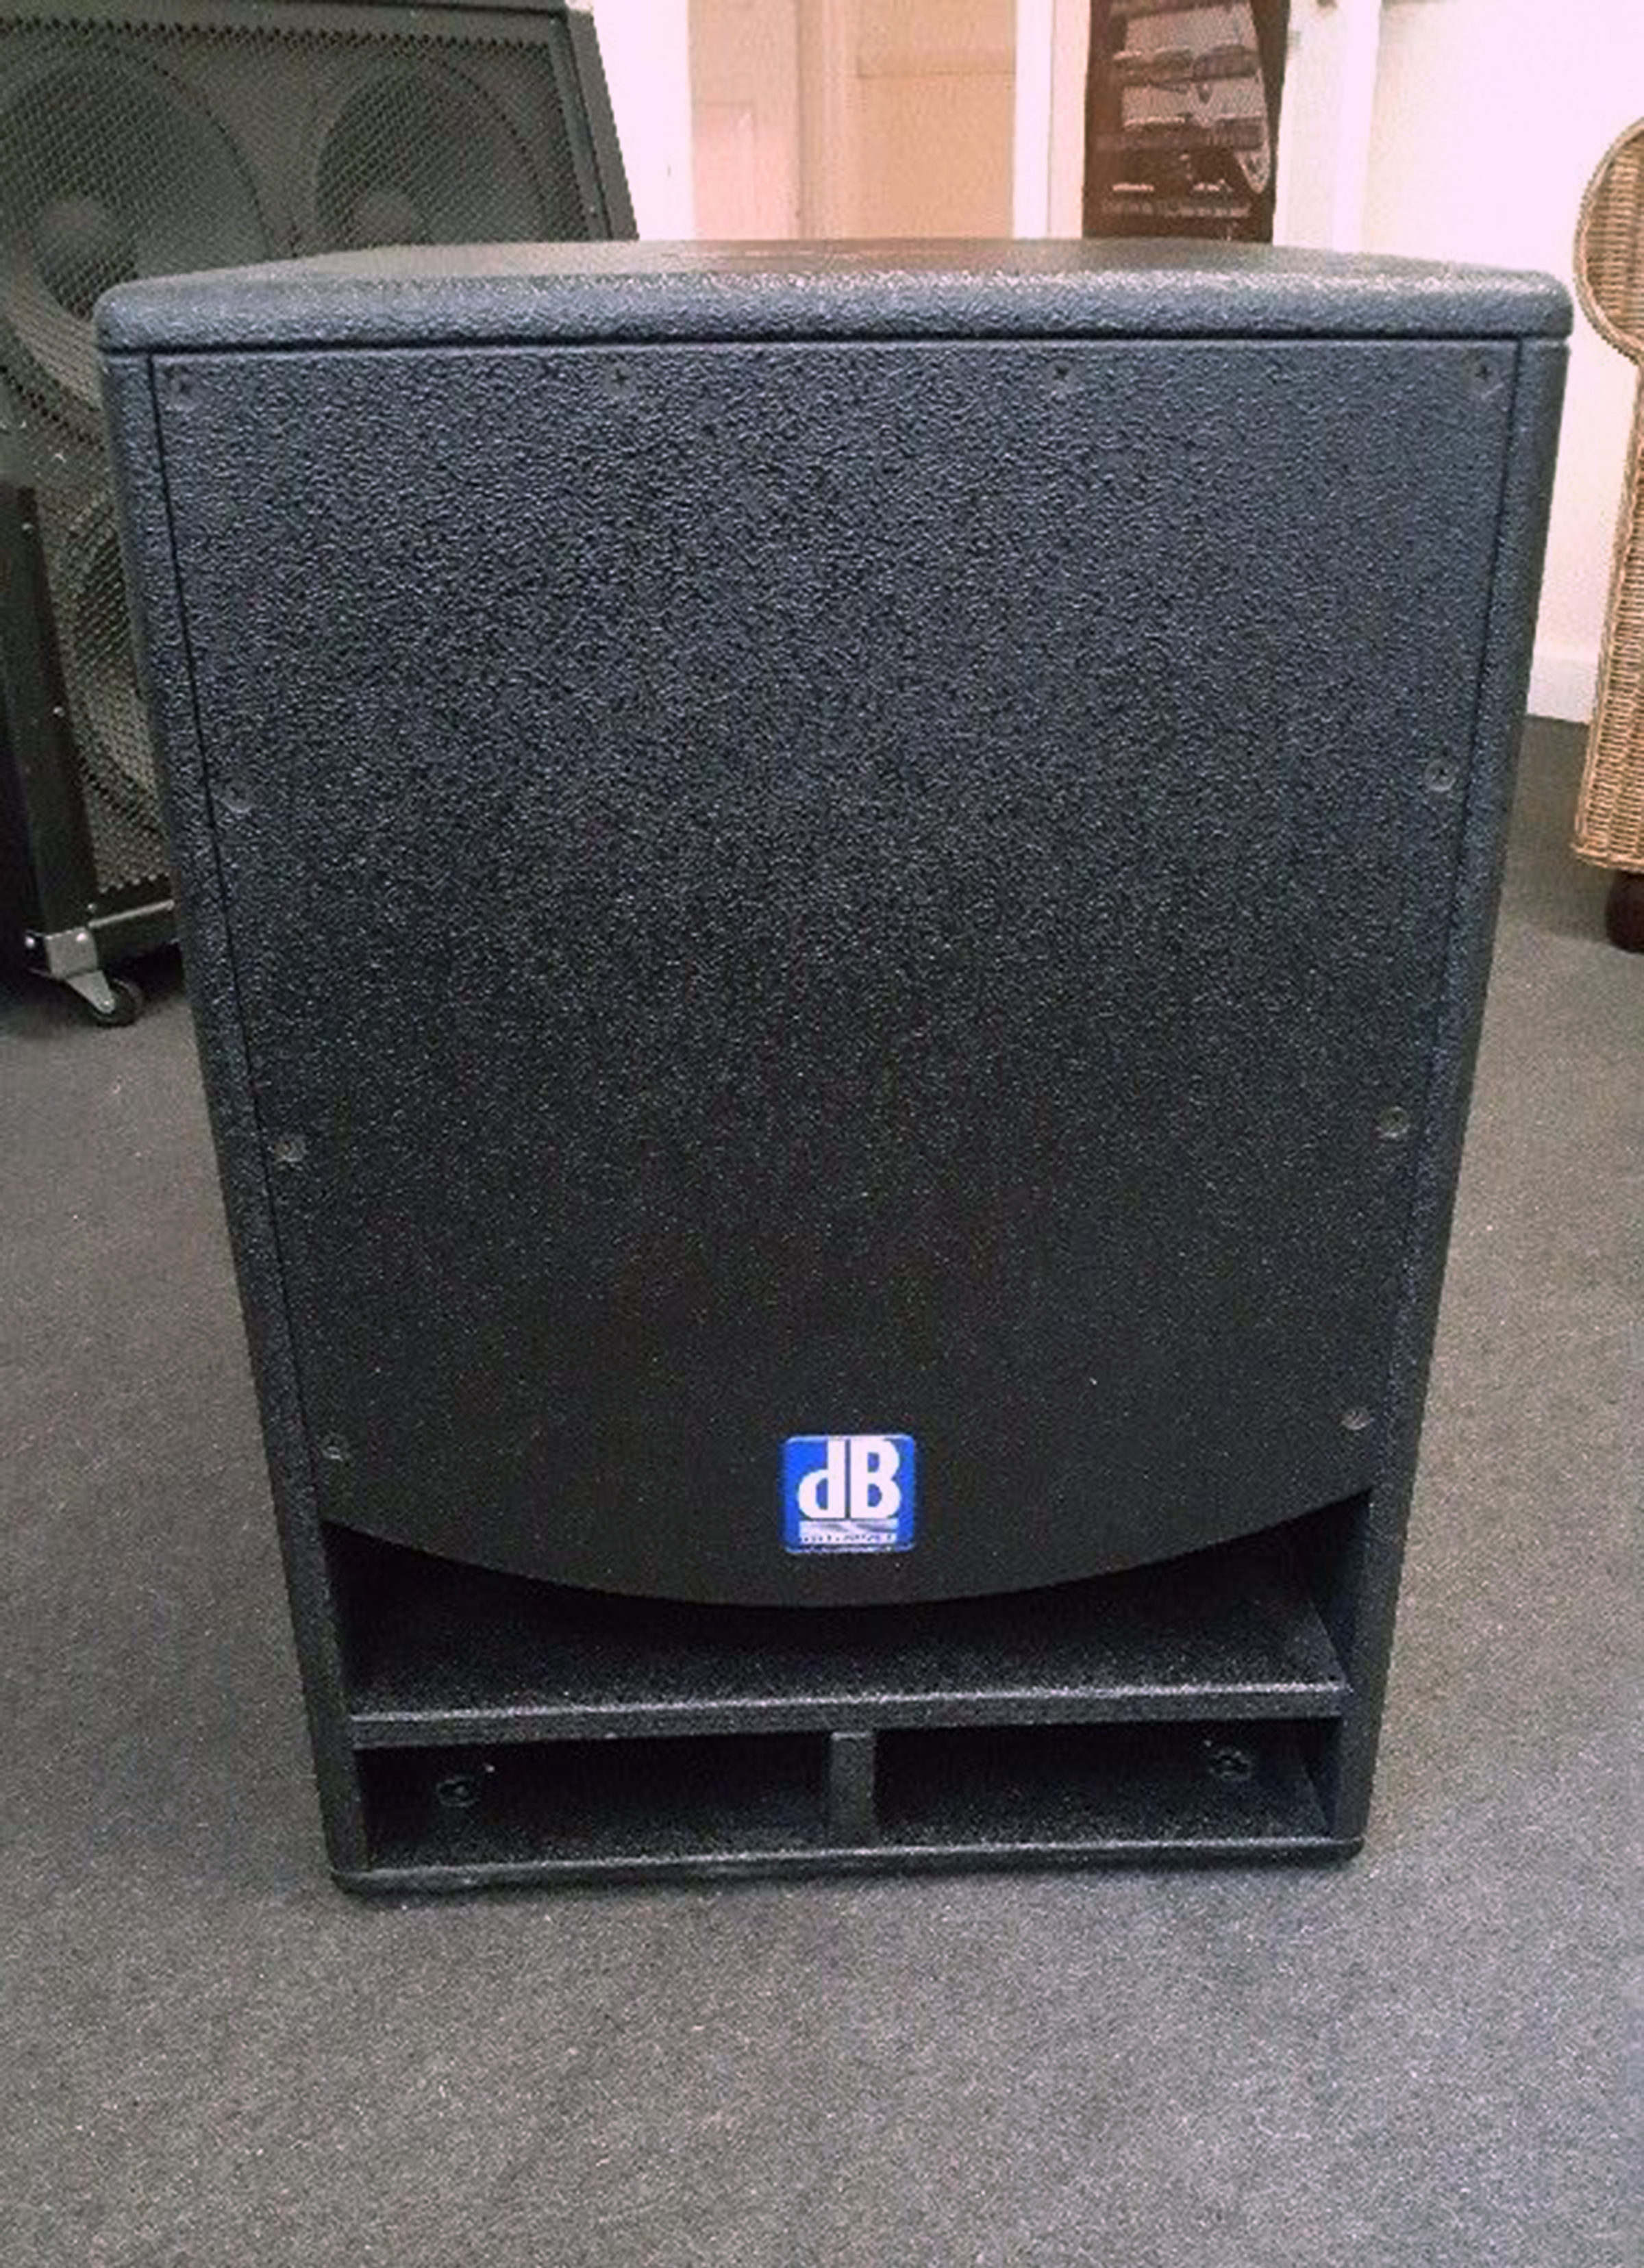 OPERA SUB 15 - dB Technologies Opera Sub 15 - Audiofanzine